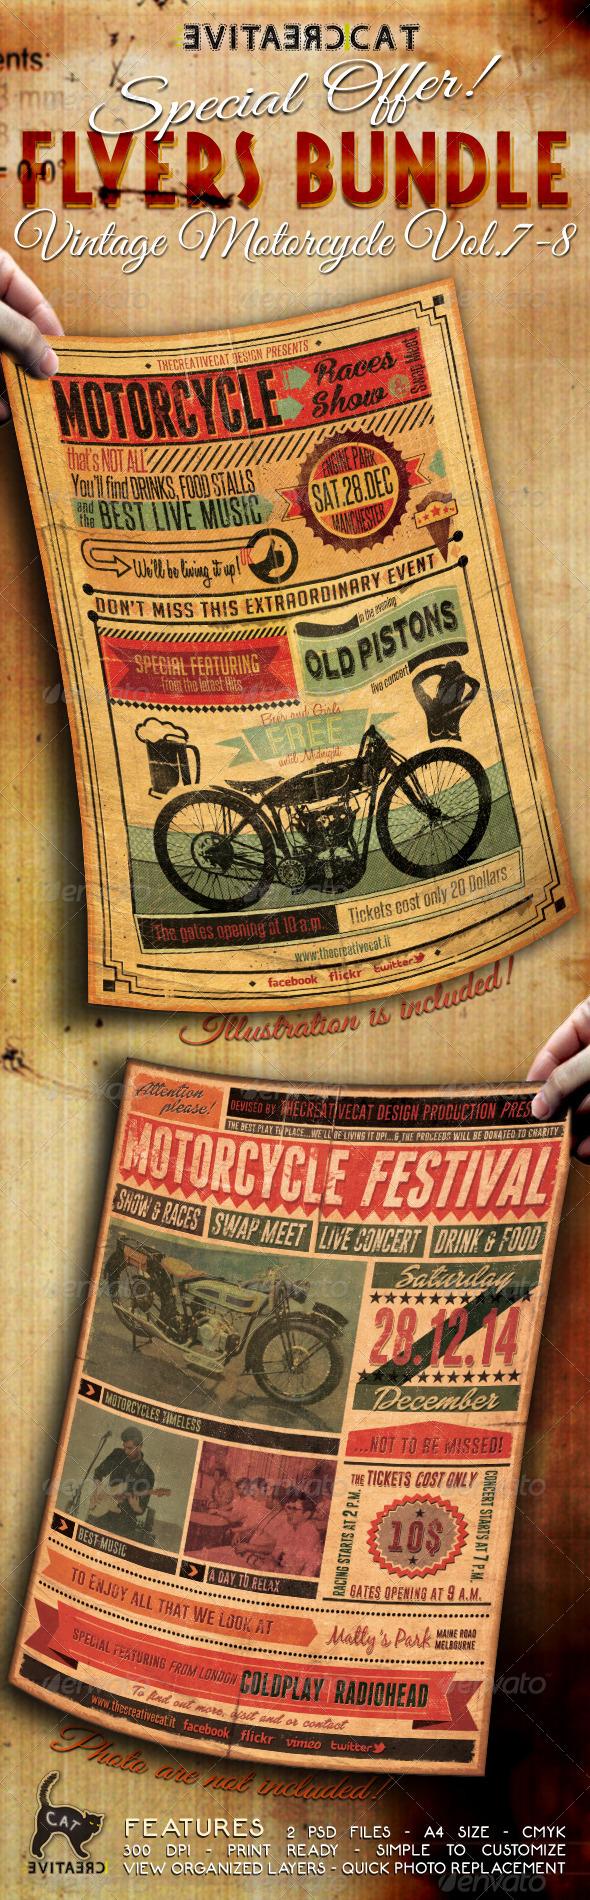 Vintage Motorcycle Flyer/Poster Bundle Vol. 7-8 - Events Flyers